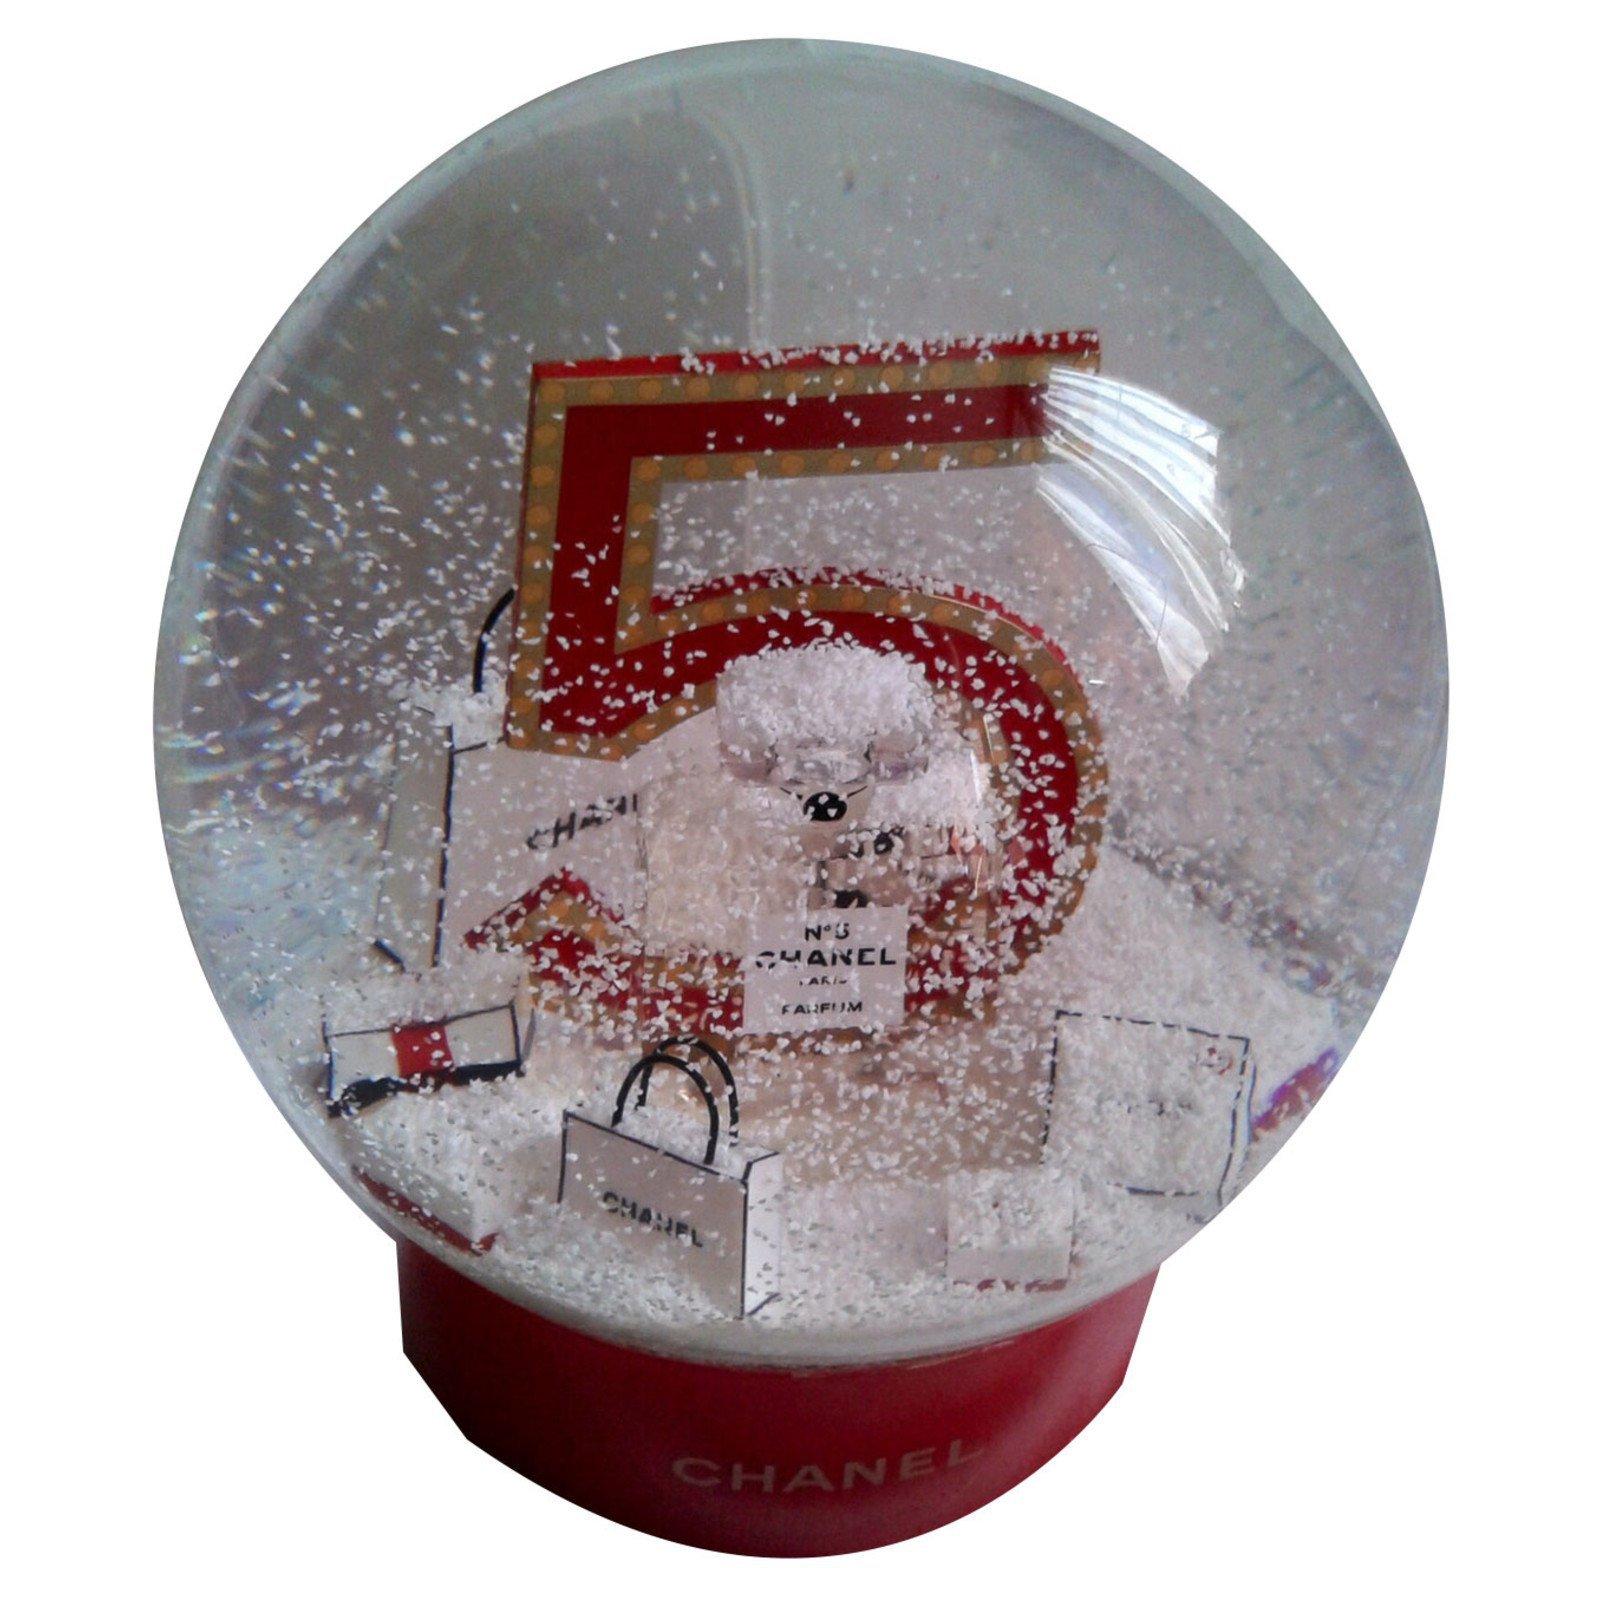 d coration divers chanel boule neige 5 verre rouge ref. Black Bedroom Furniture Sets. Home Design Ideas